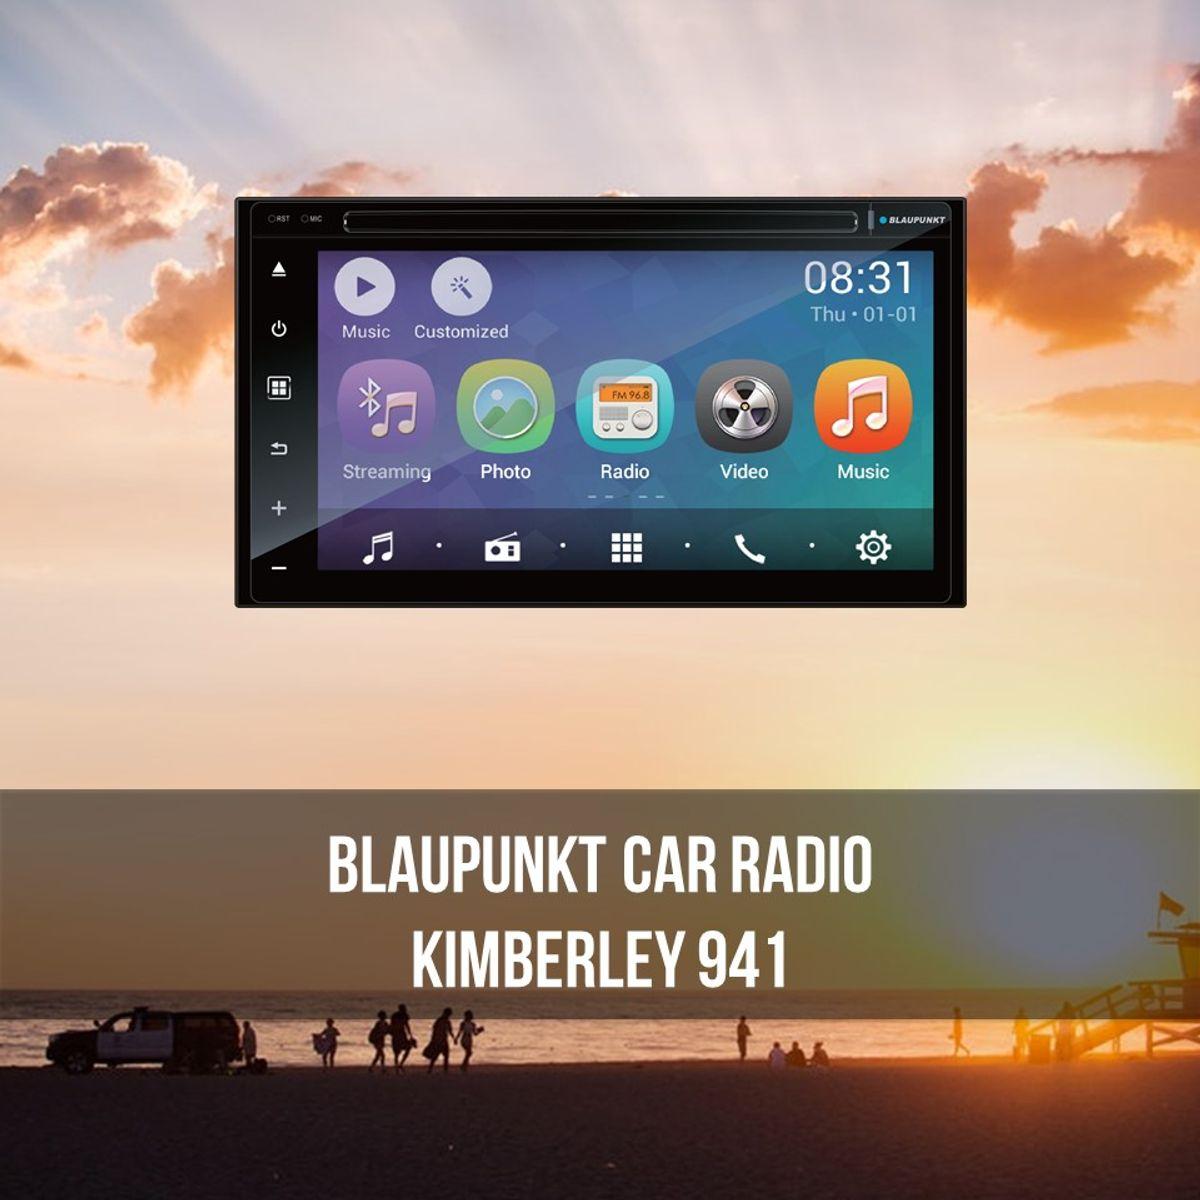 Entertainment filled car radio,Blaupunkt Kimberly 941